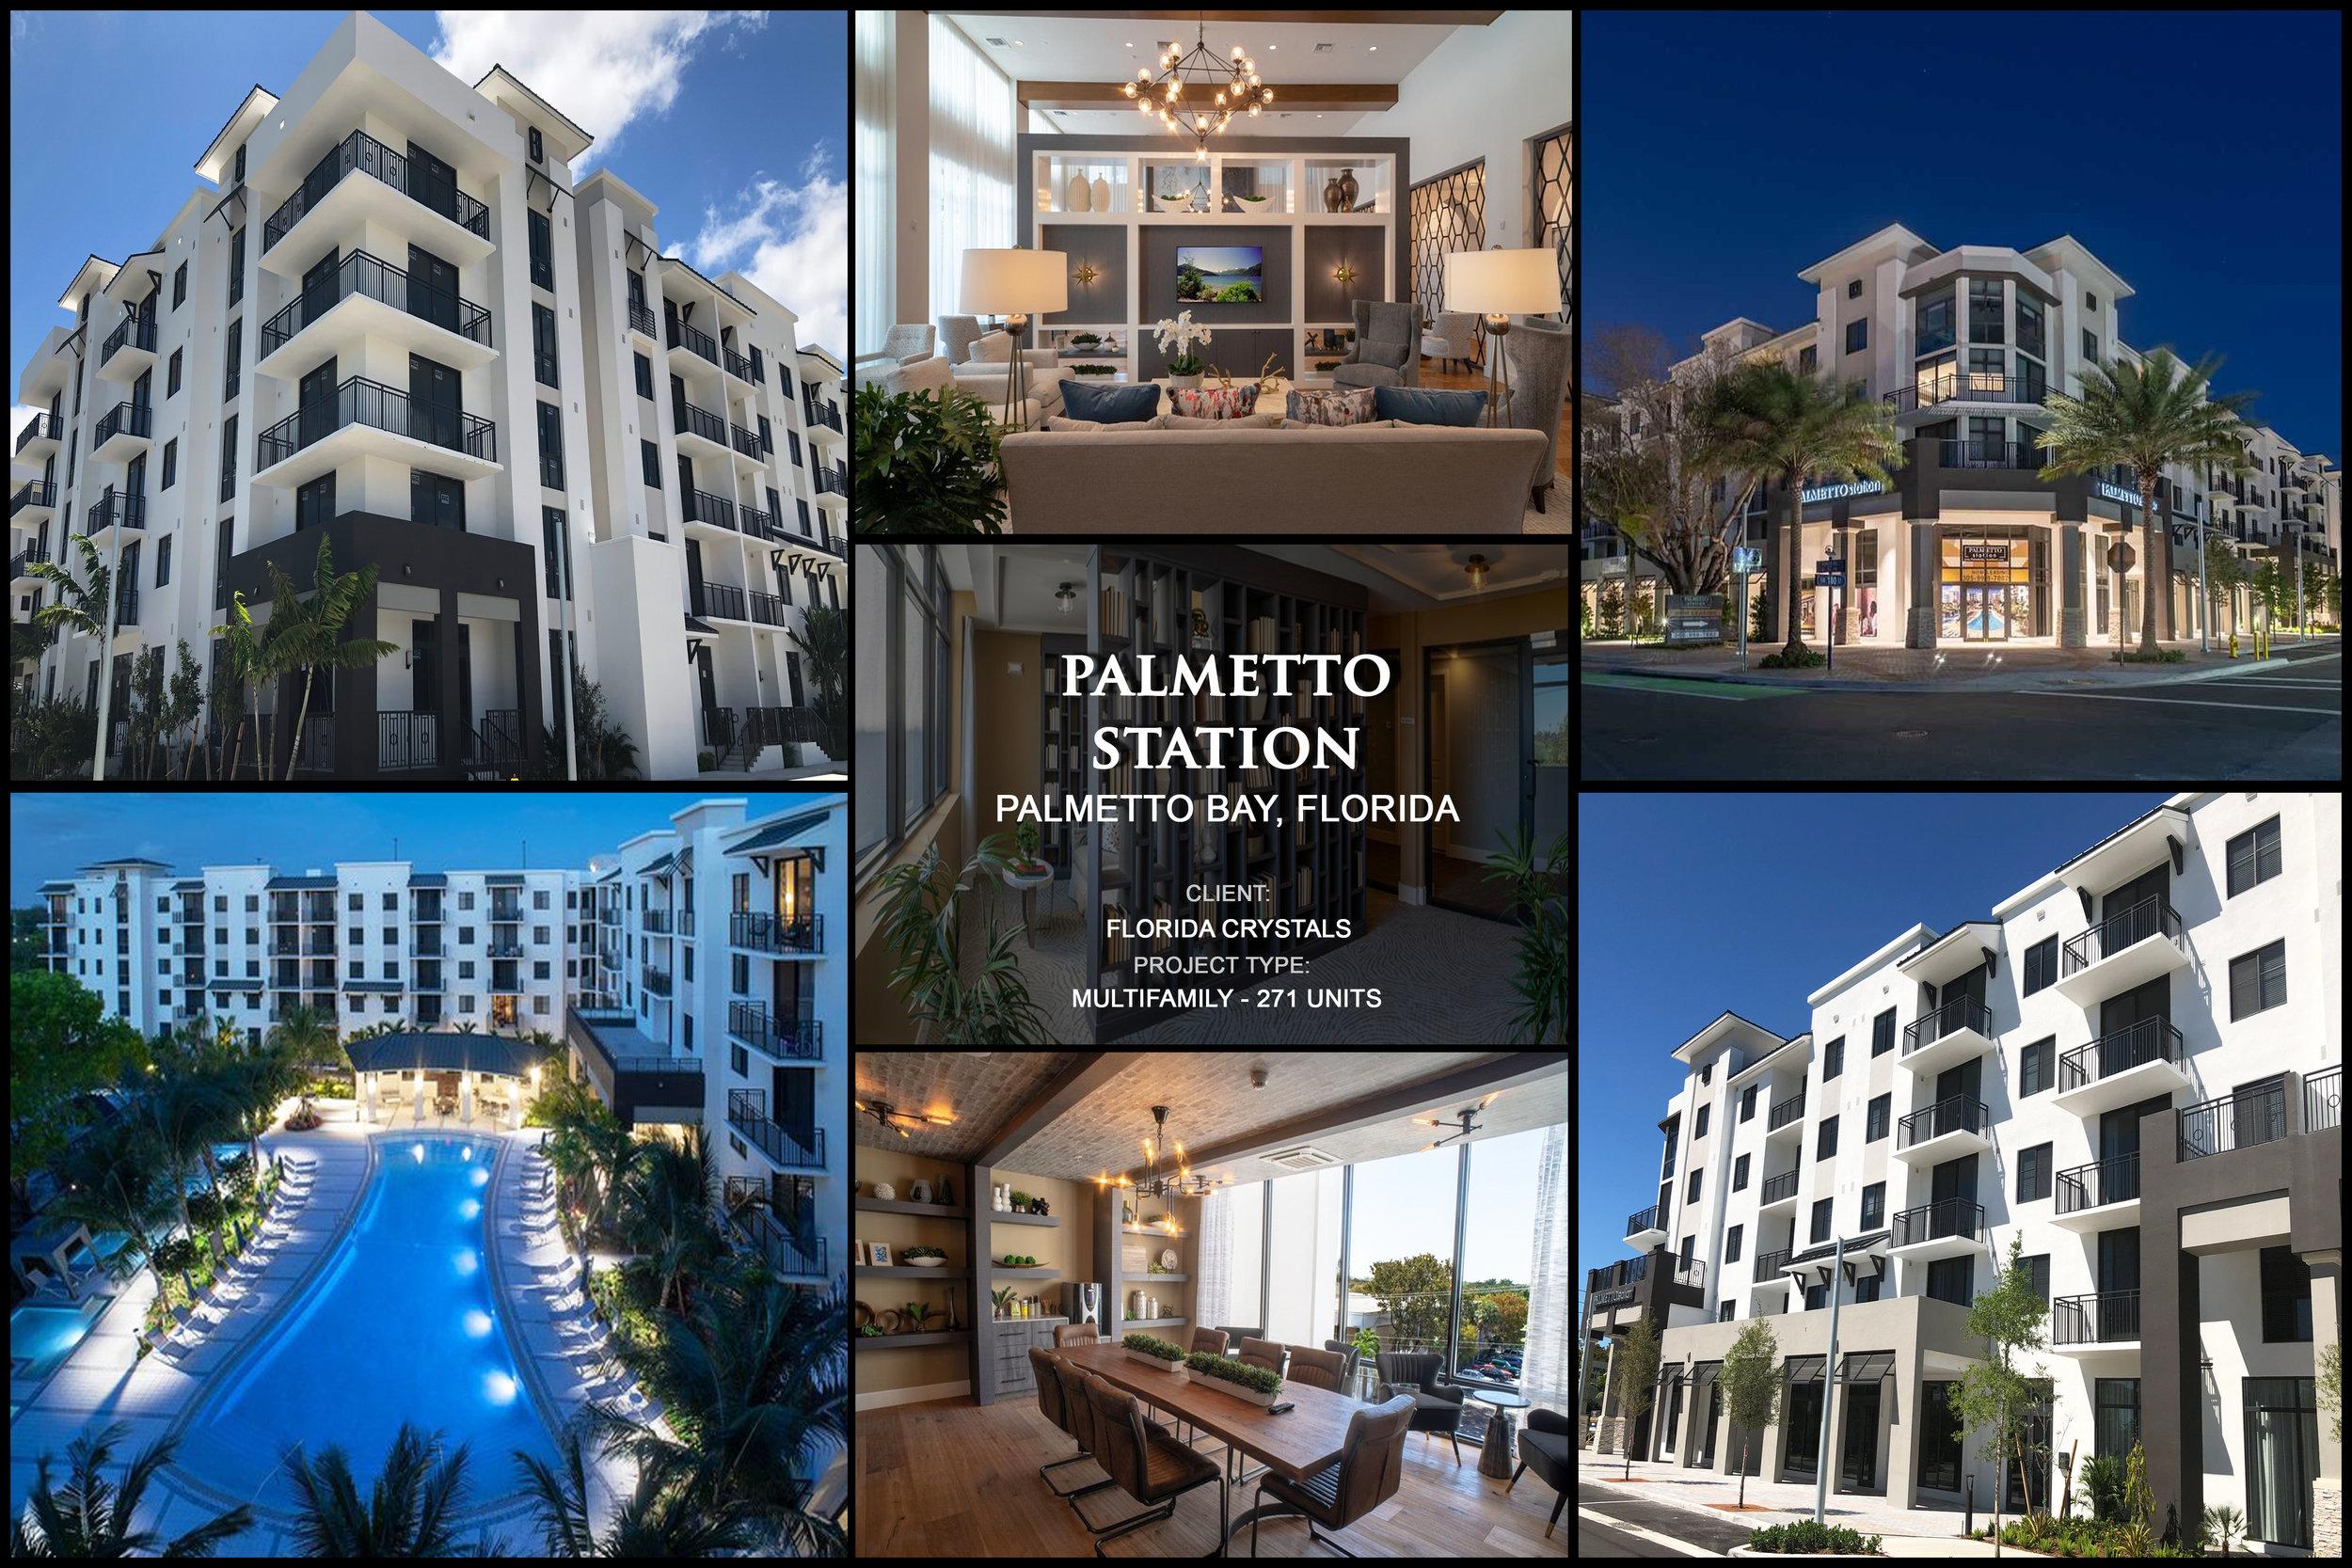 Palmetto Station